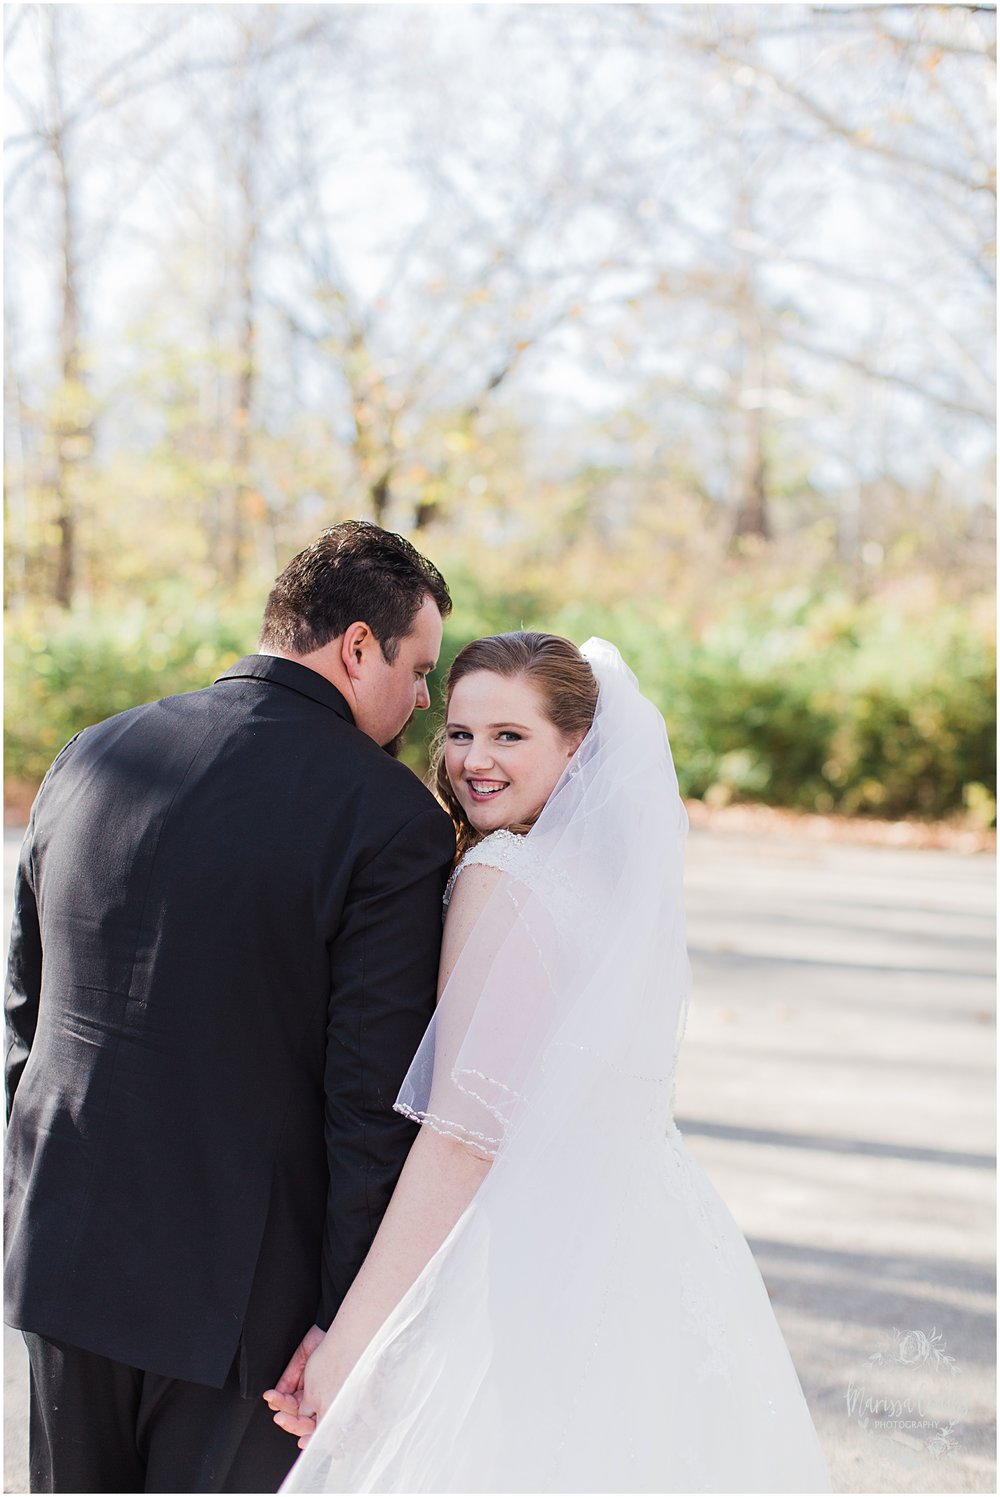 2017 wedding recap | MARISSA CRIBBS PHOTOGRAPHY_4103.jpg